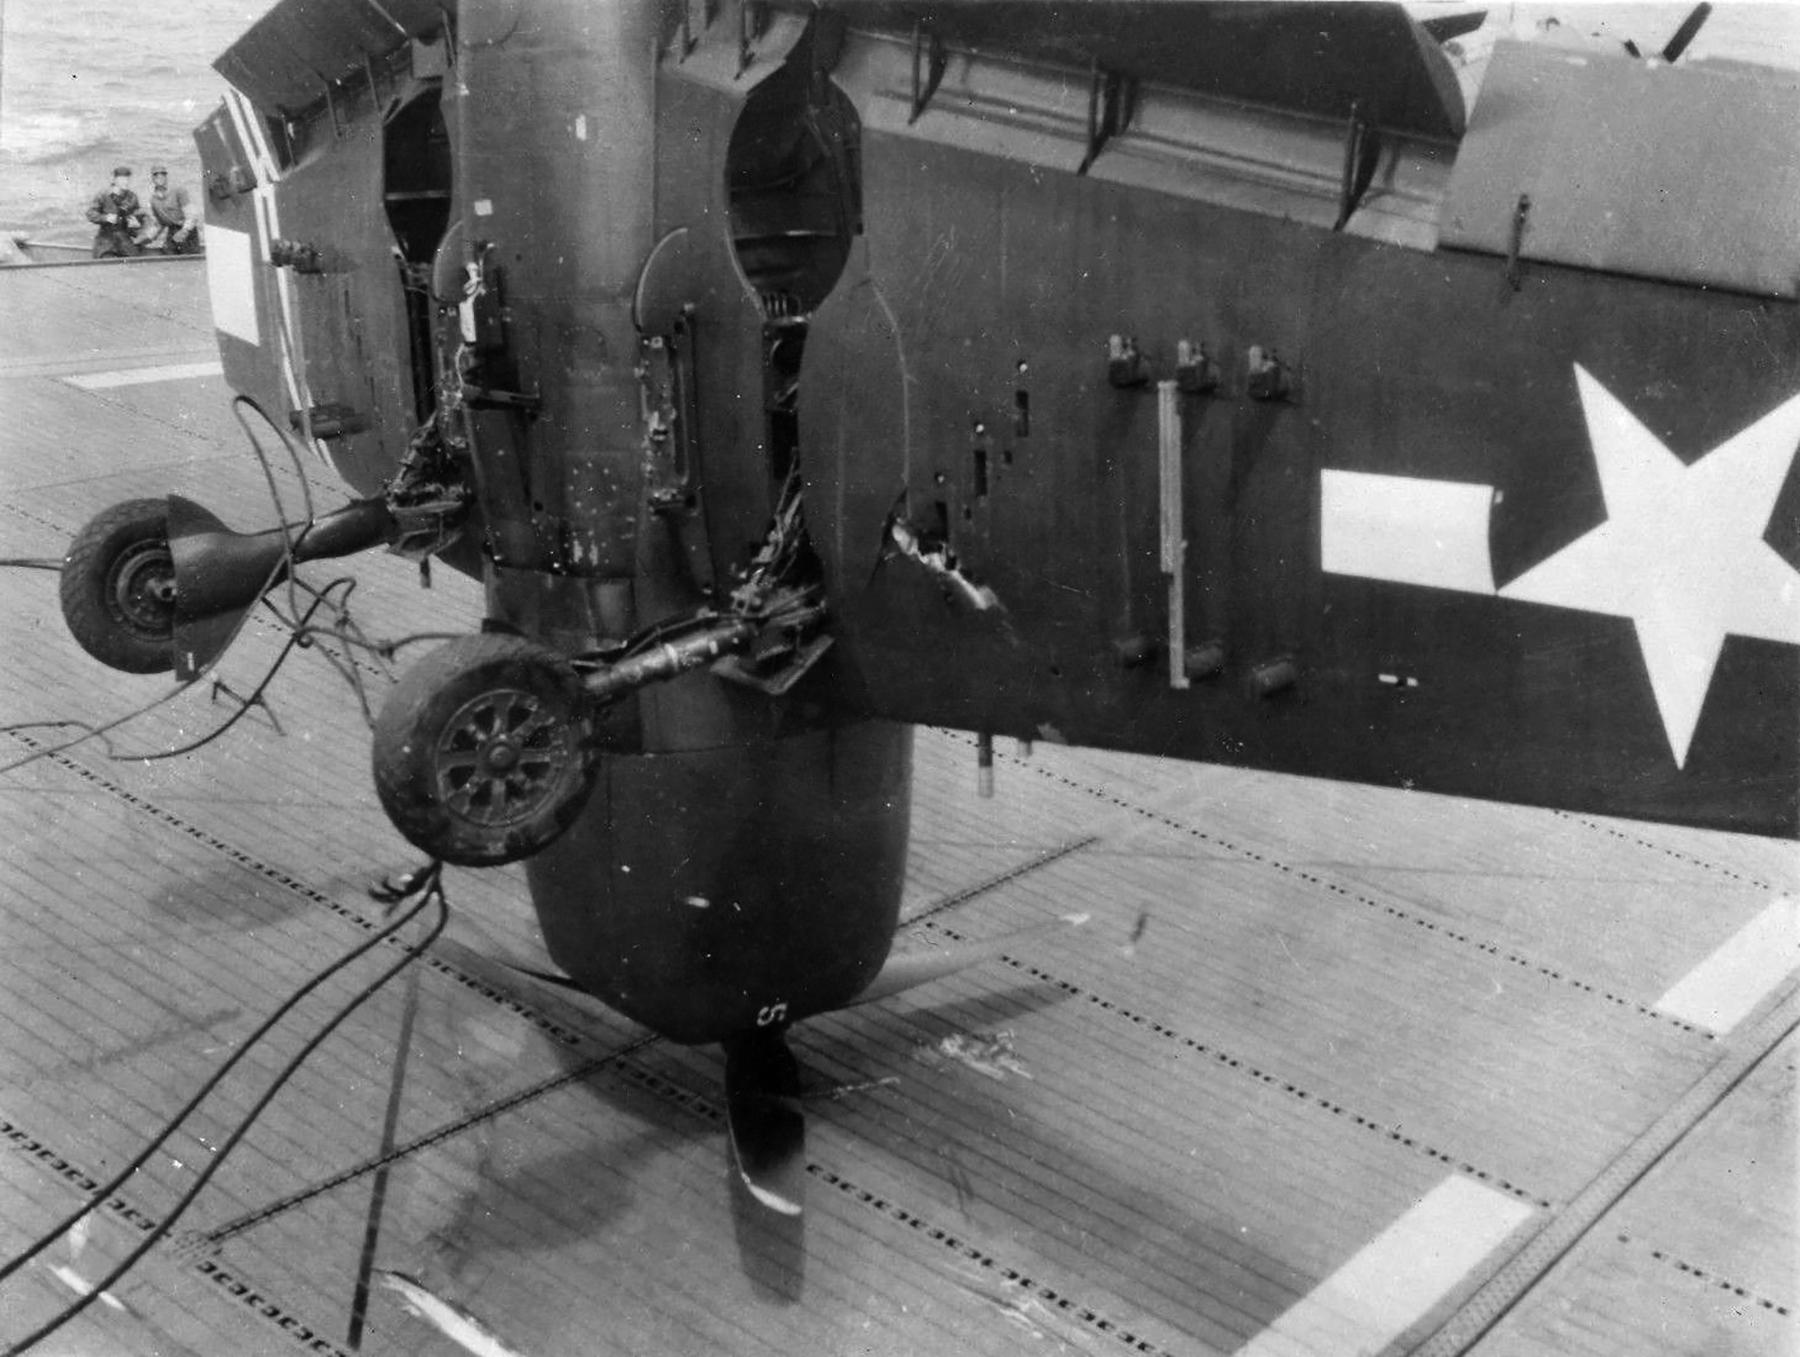 Grumman F6F 5 Hellcat VF 36 White 5 landing mishap CVE 112 USS Siboney Aug 1945 May 1946 04